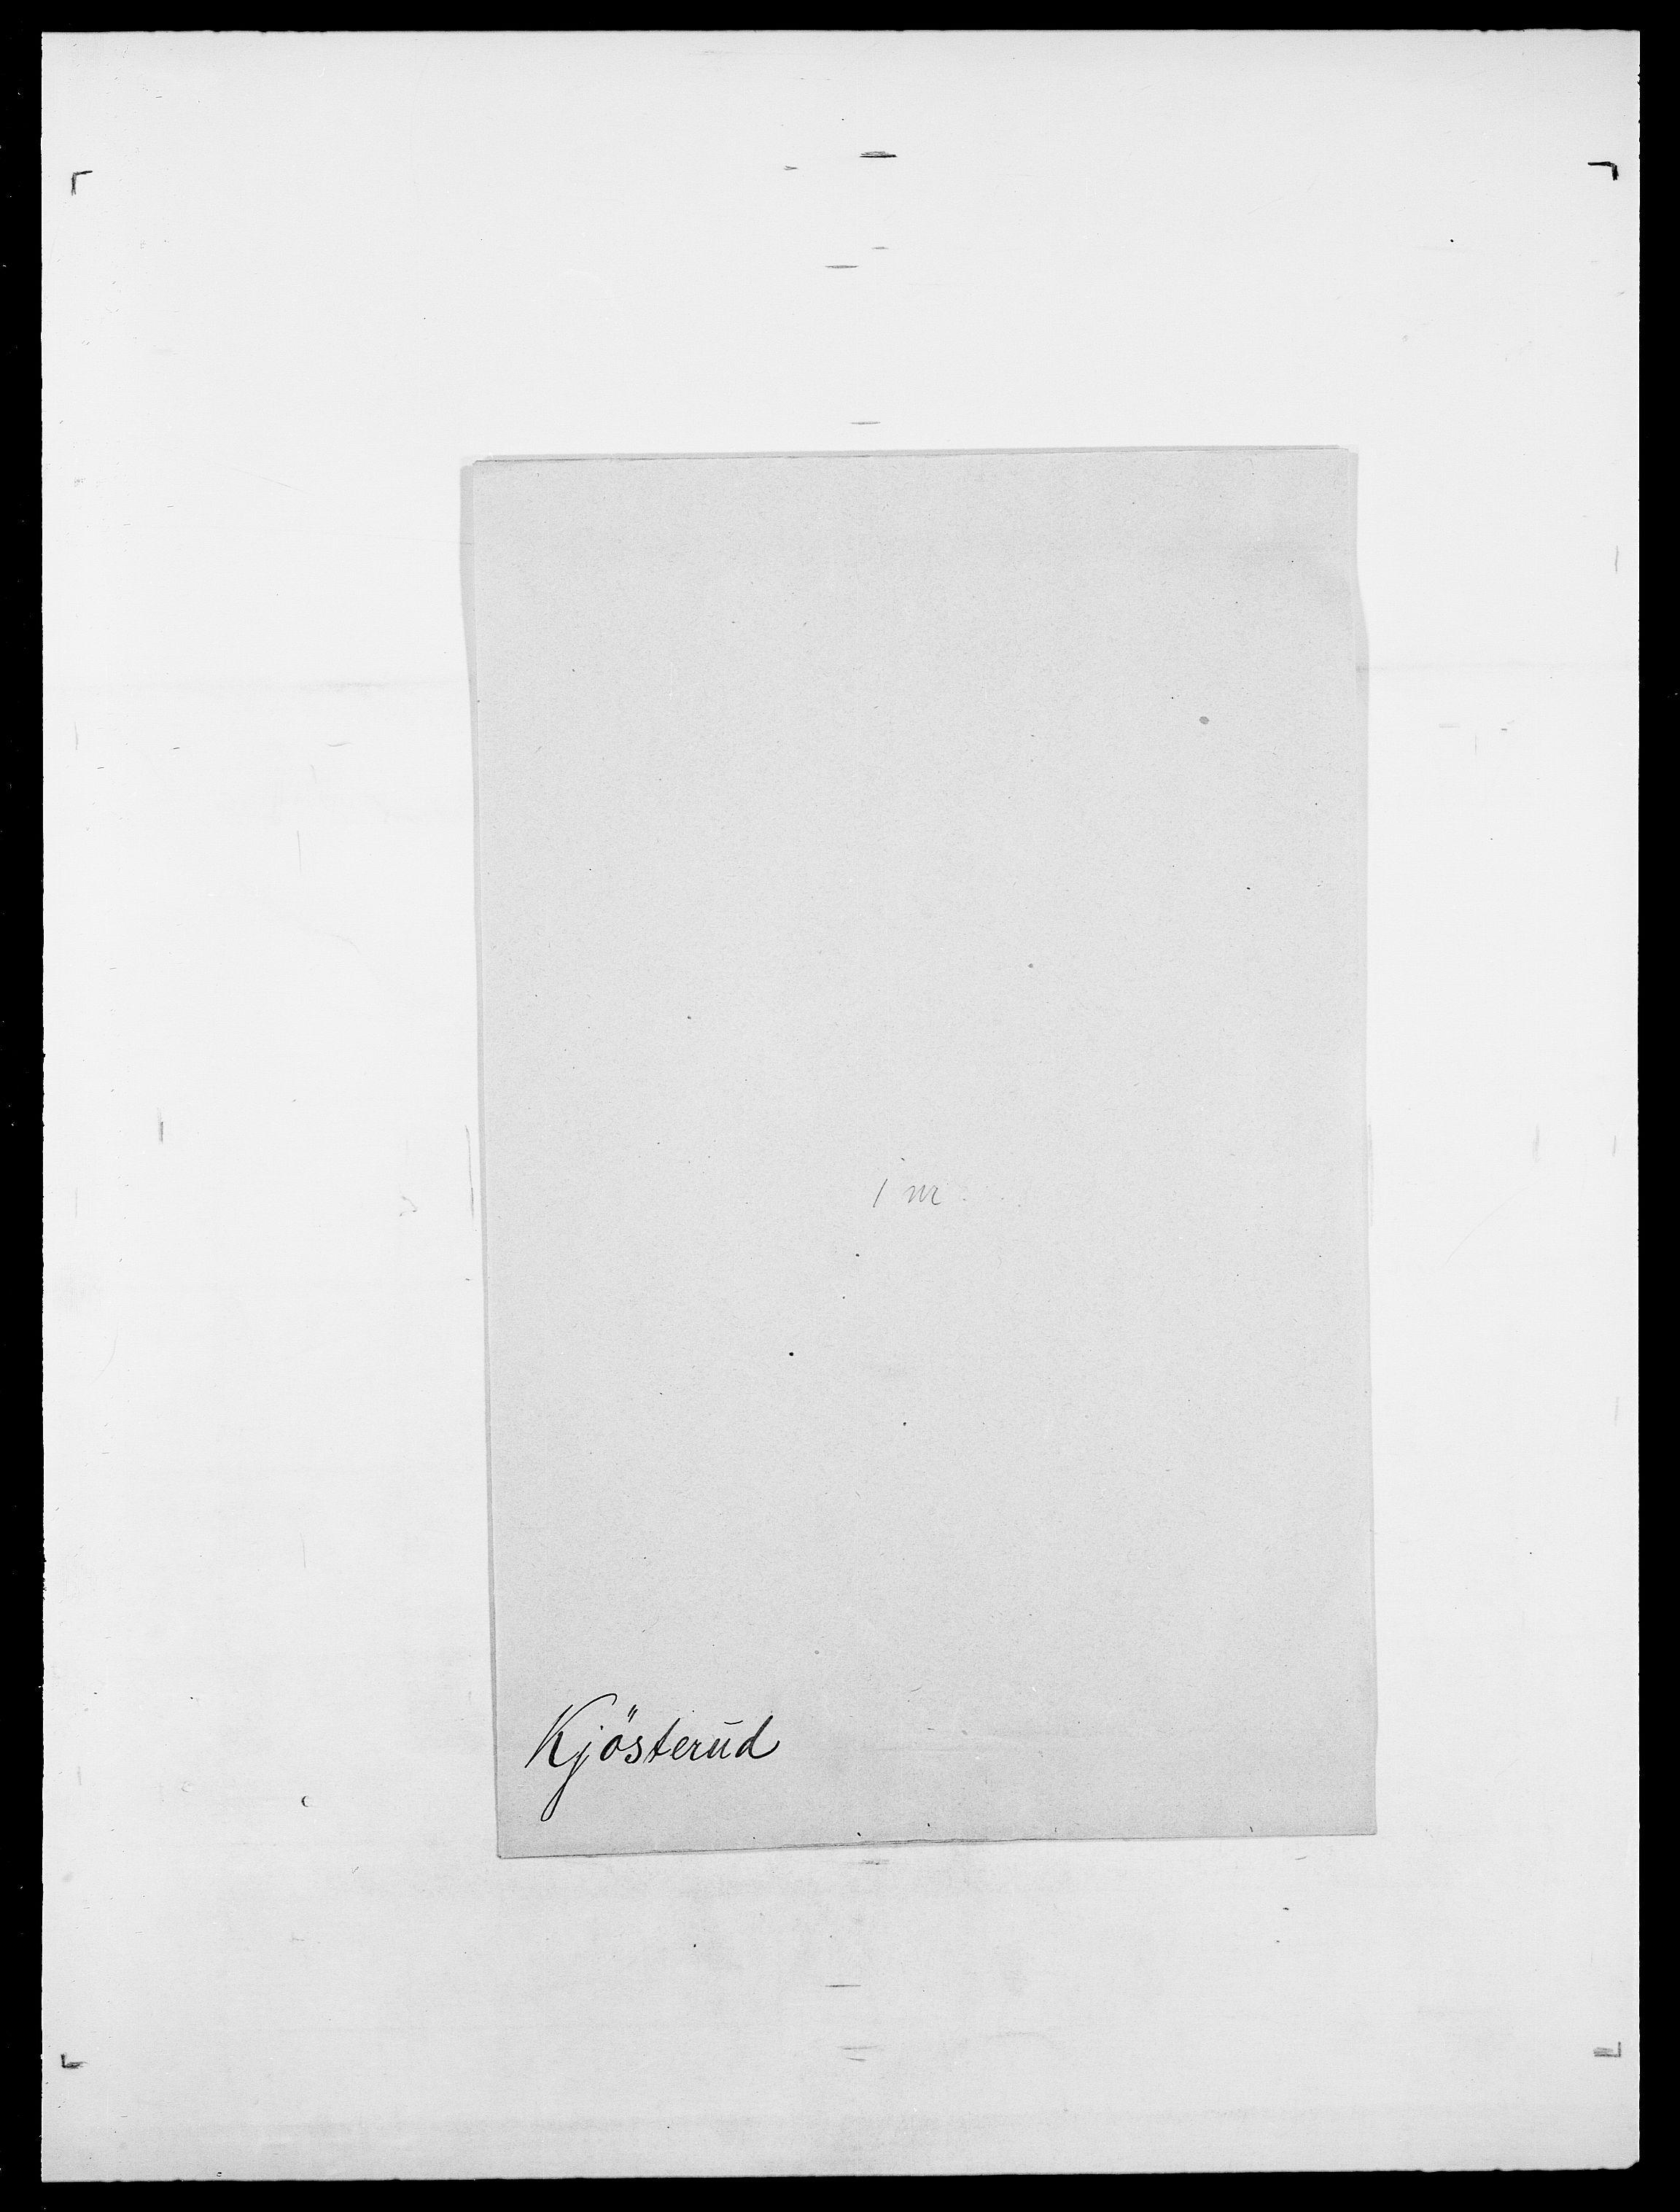 SAO, Delgobe, Charles Antoine - samling, D/Da/L0020: Irgens - Kjøsterud, s. 853